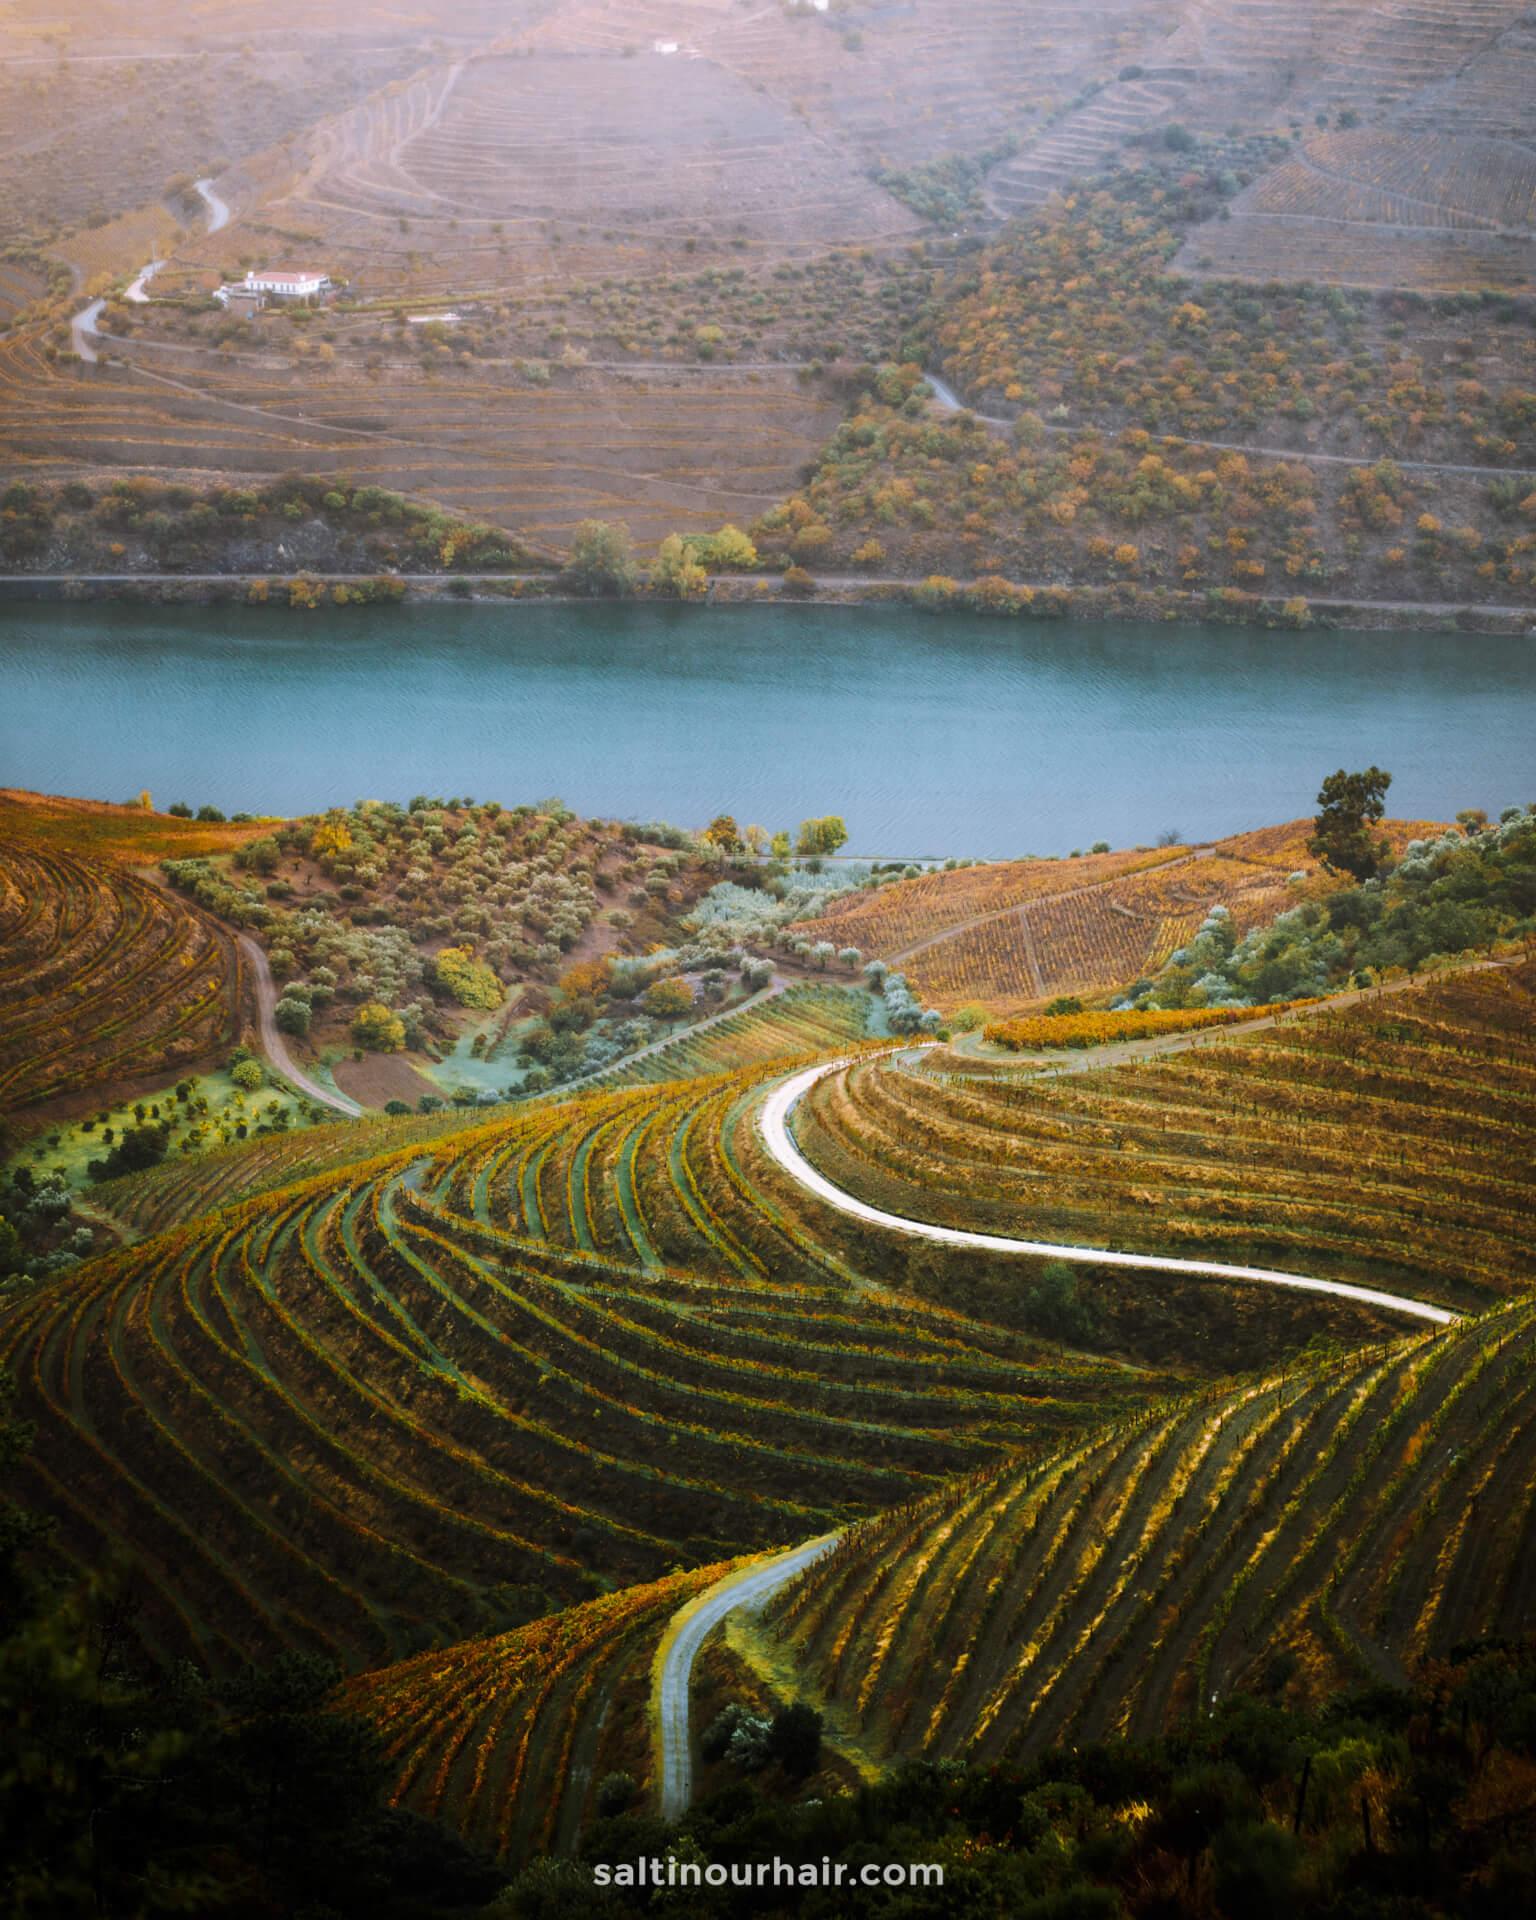 duoro vallei mooiste plekken in portugal wijn